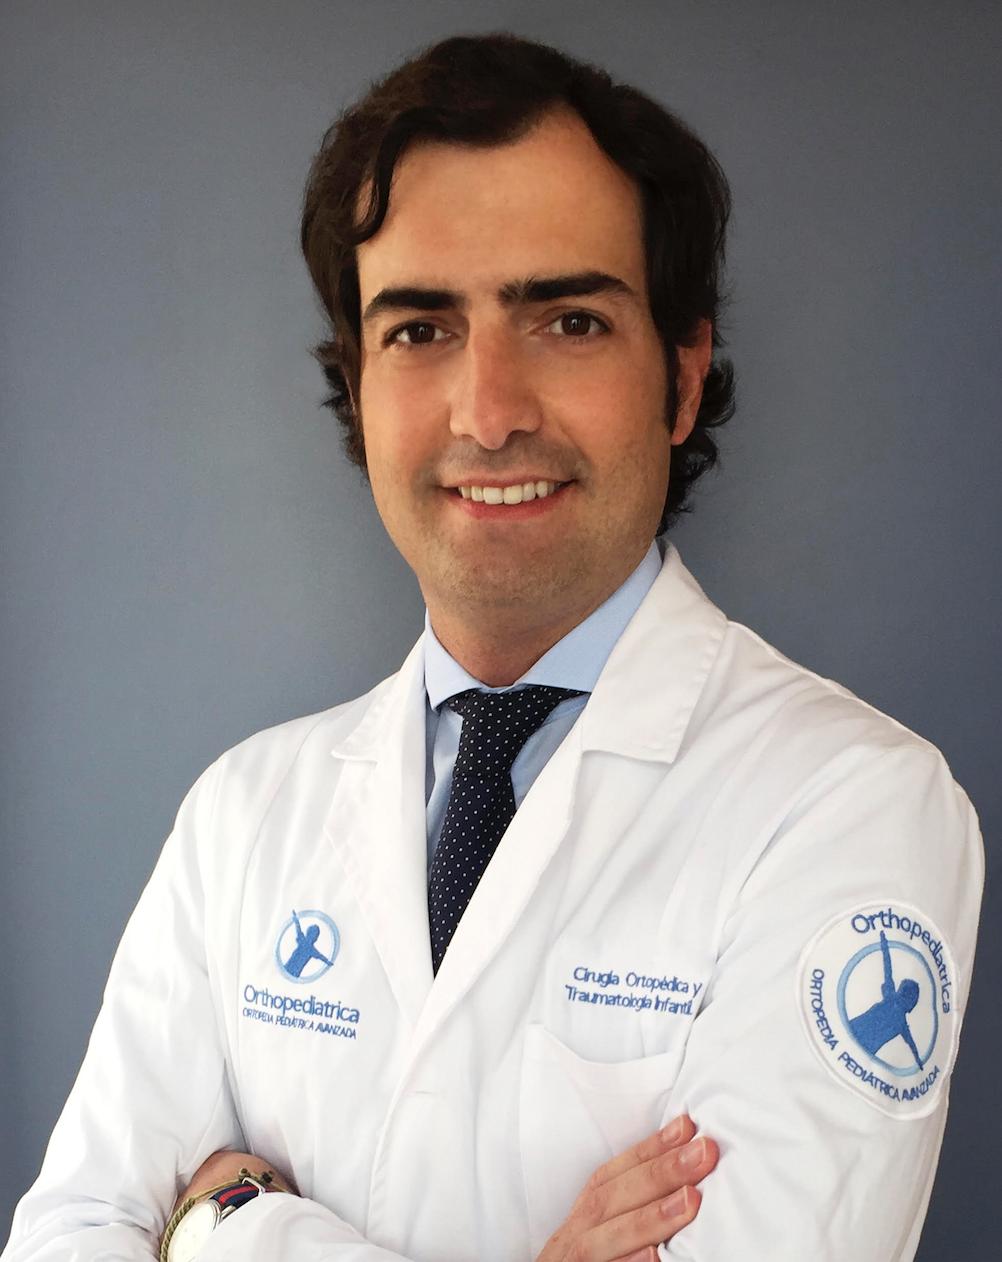 Dr. Javier Mata